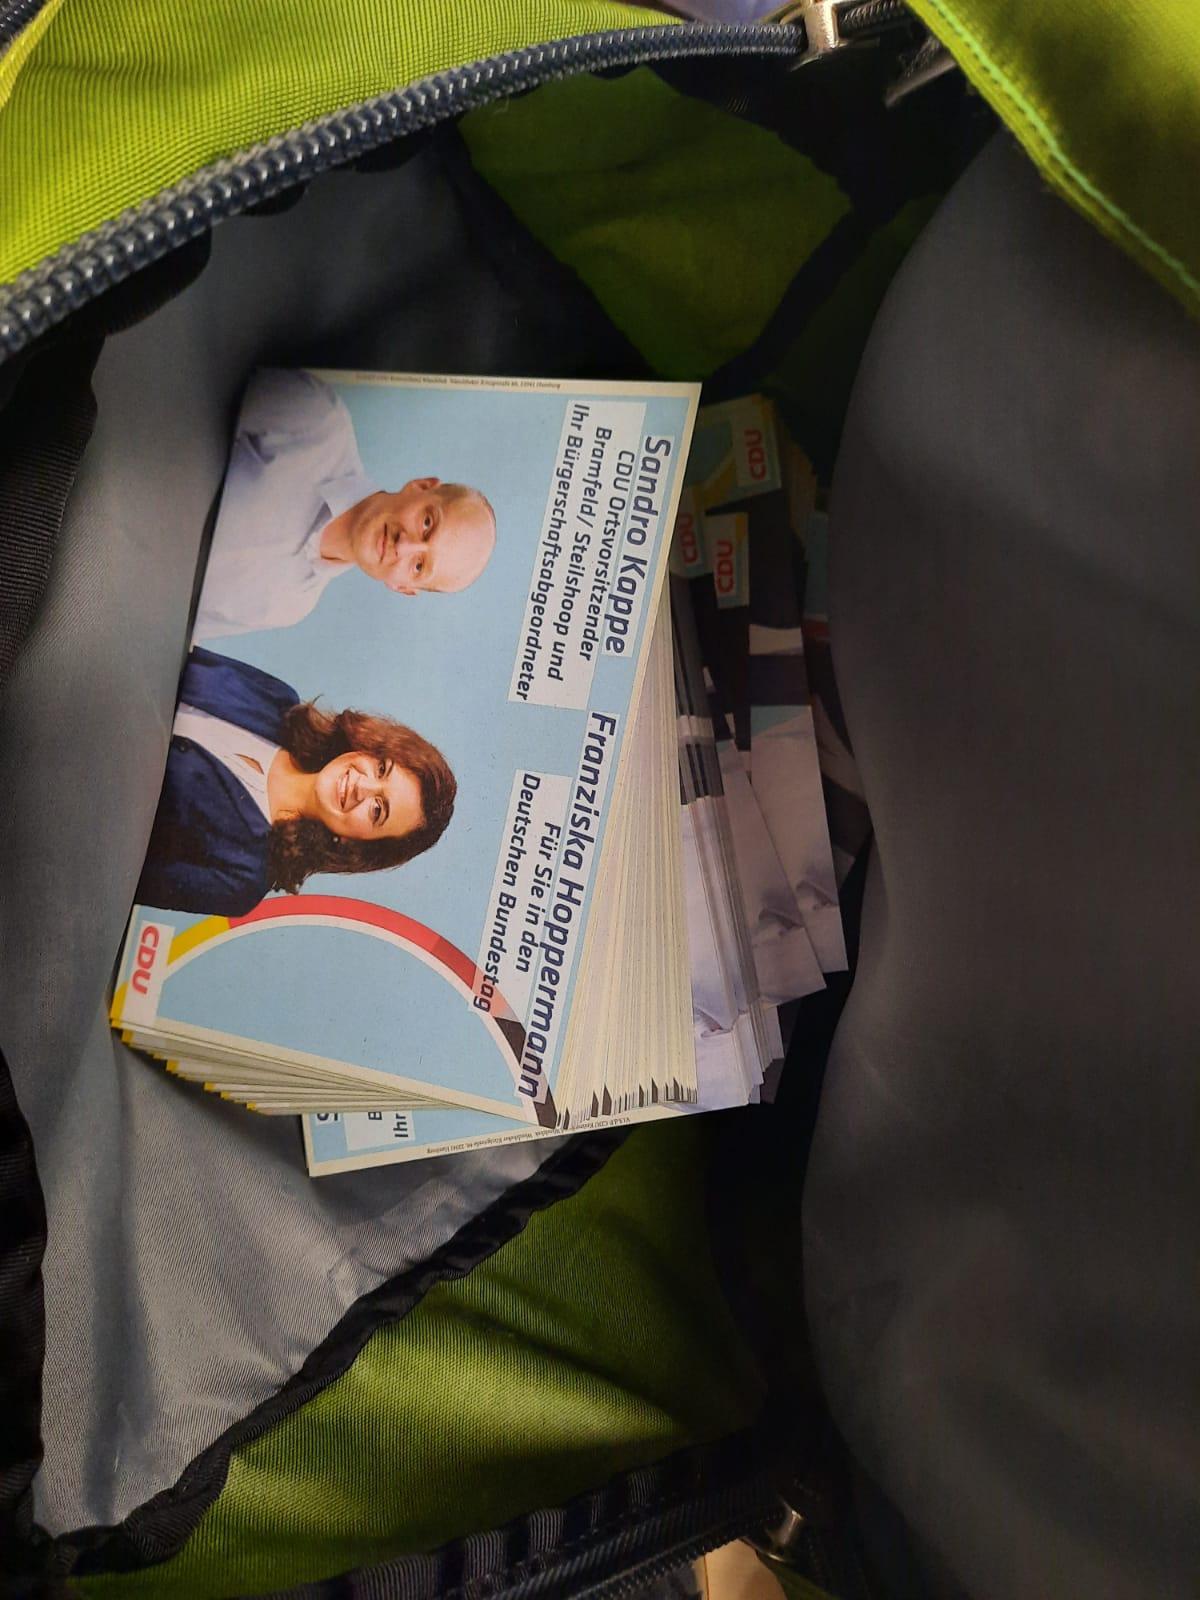 Osteraktion mit Franziska Hoppermann – Wir zeigen Flagge!